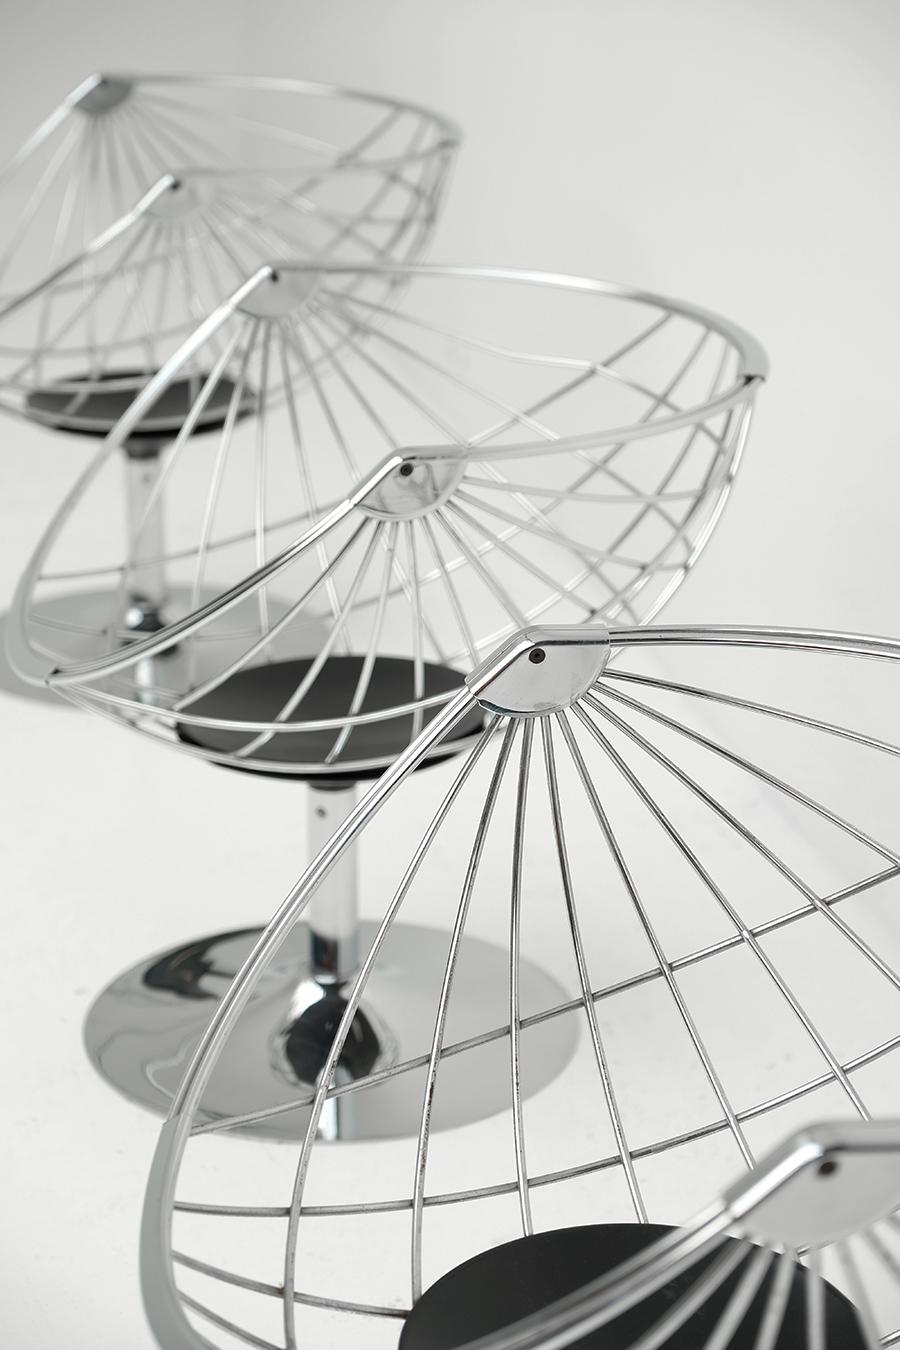 Rudy Verelst Novalux chairs image 5